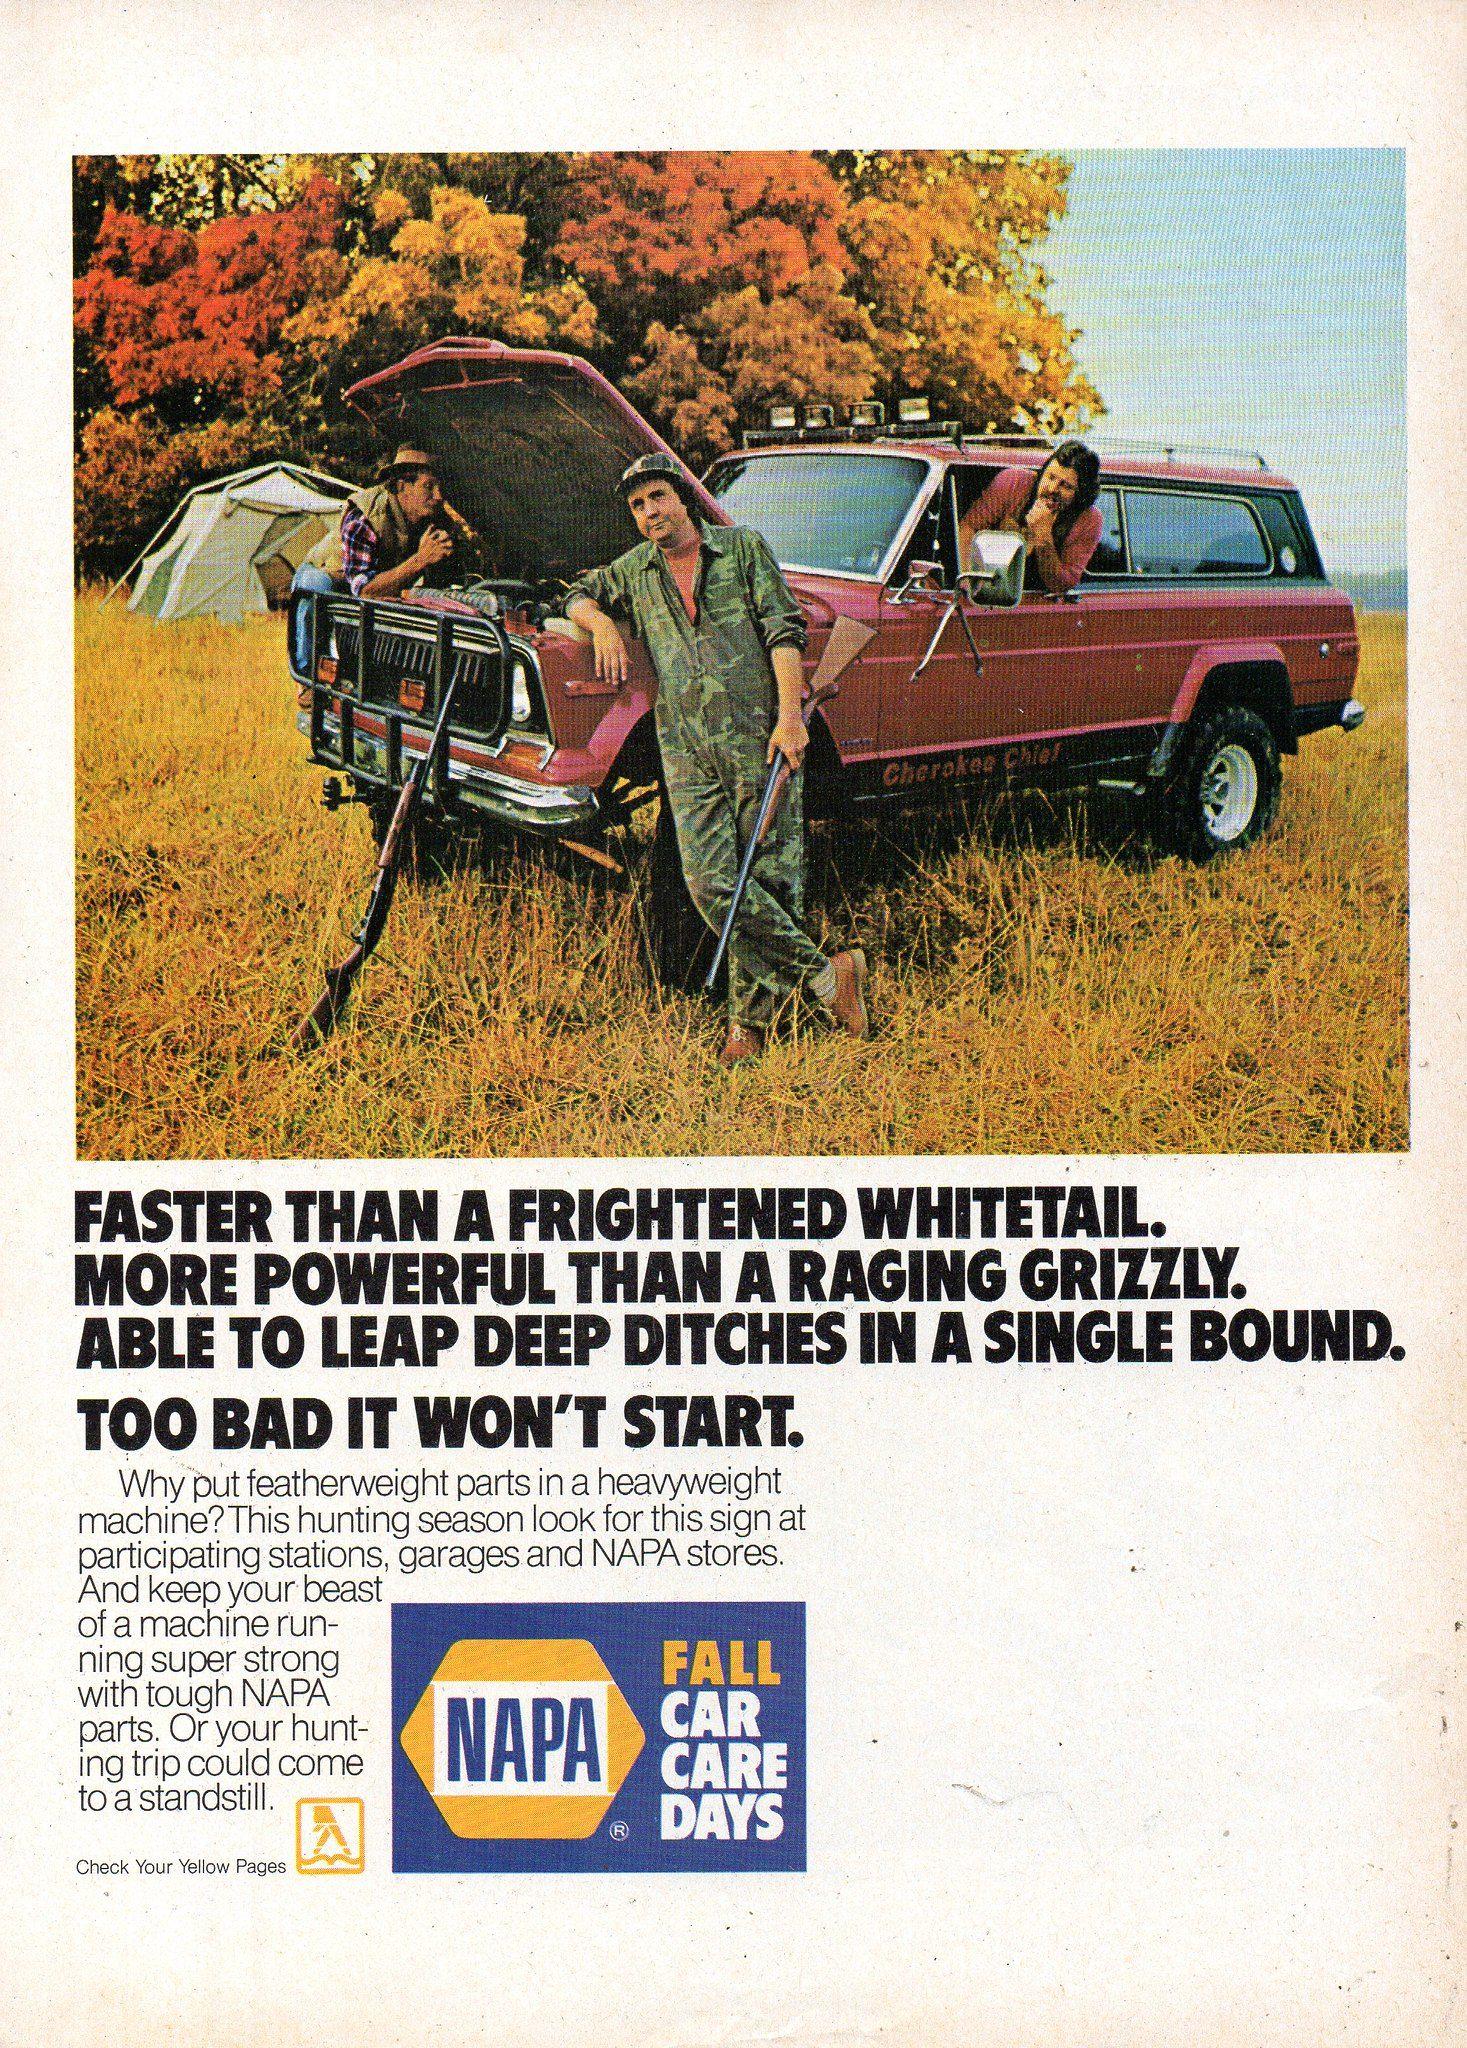 1984 Napa Car Care Parts Accessories American Motors Jeep Cherokee Usa Original Magazine Advertisement Jeep Cherokee American Motors Car Care